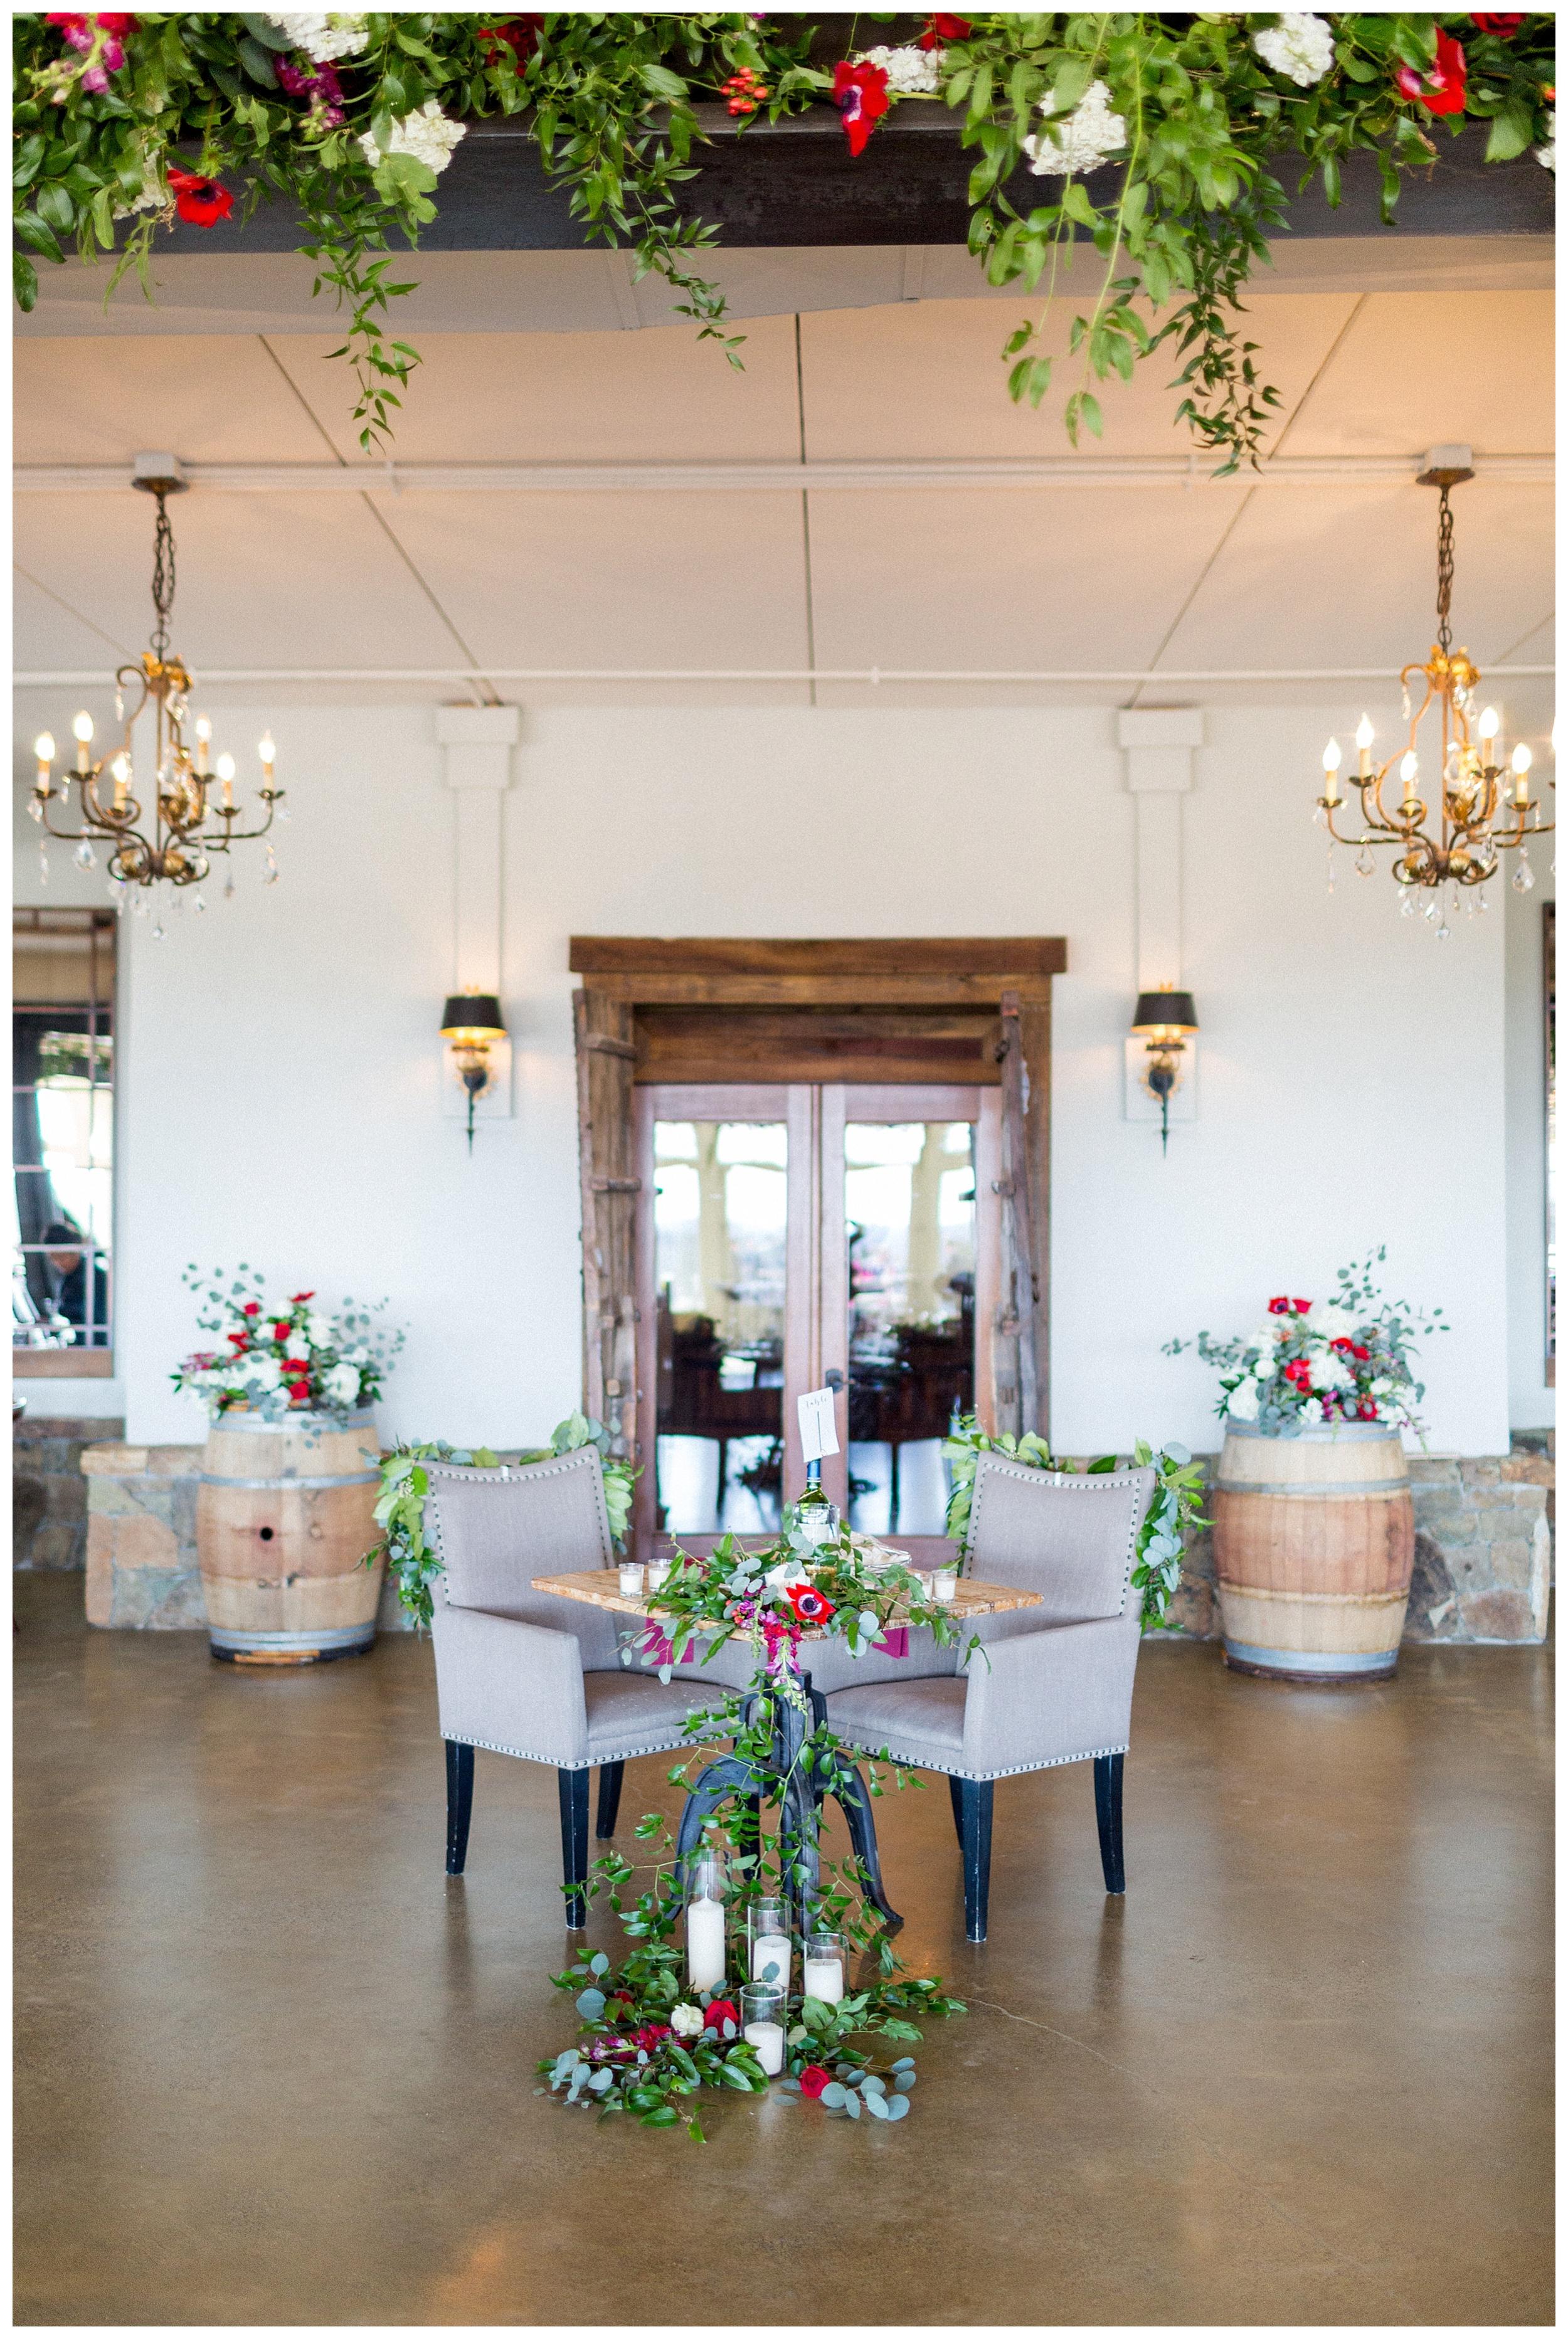 Stone Tower Winery Wedding | Virginia Winter Wedding | VA Wedding Photographer Kir Tuben_0088.jpg